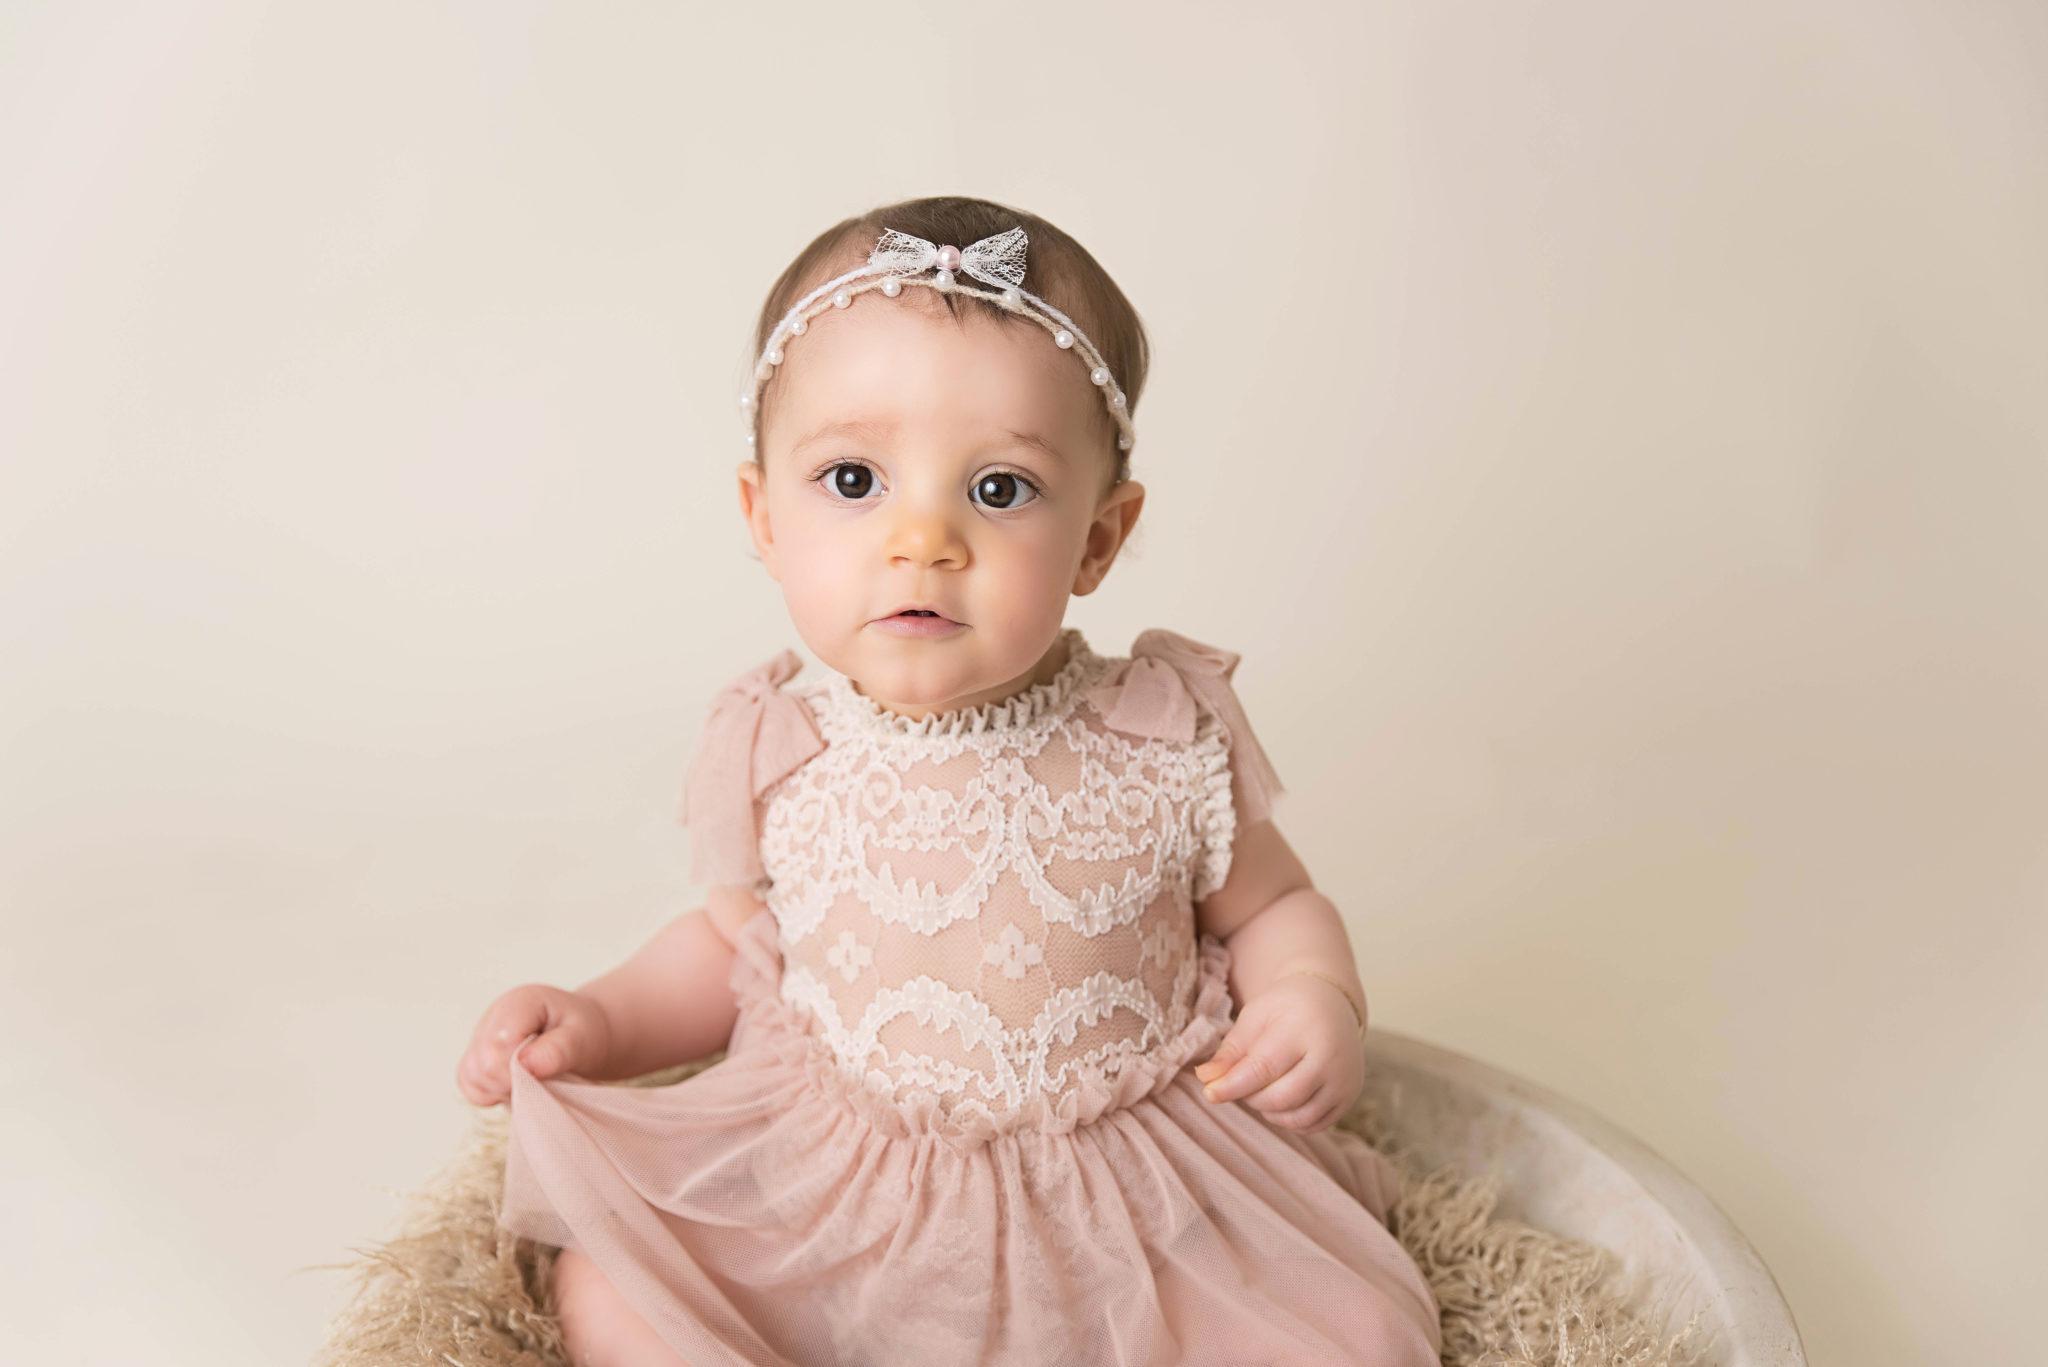 Photographe bébé oise seine et marne val d'oise ainse (1)